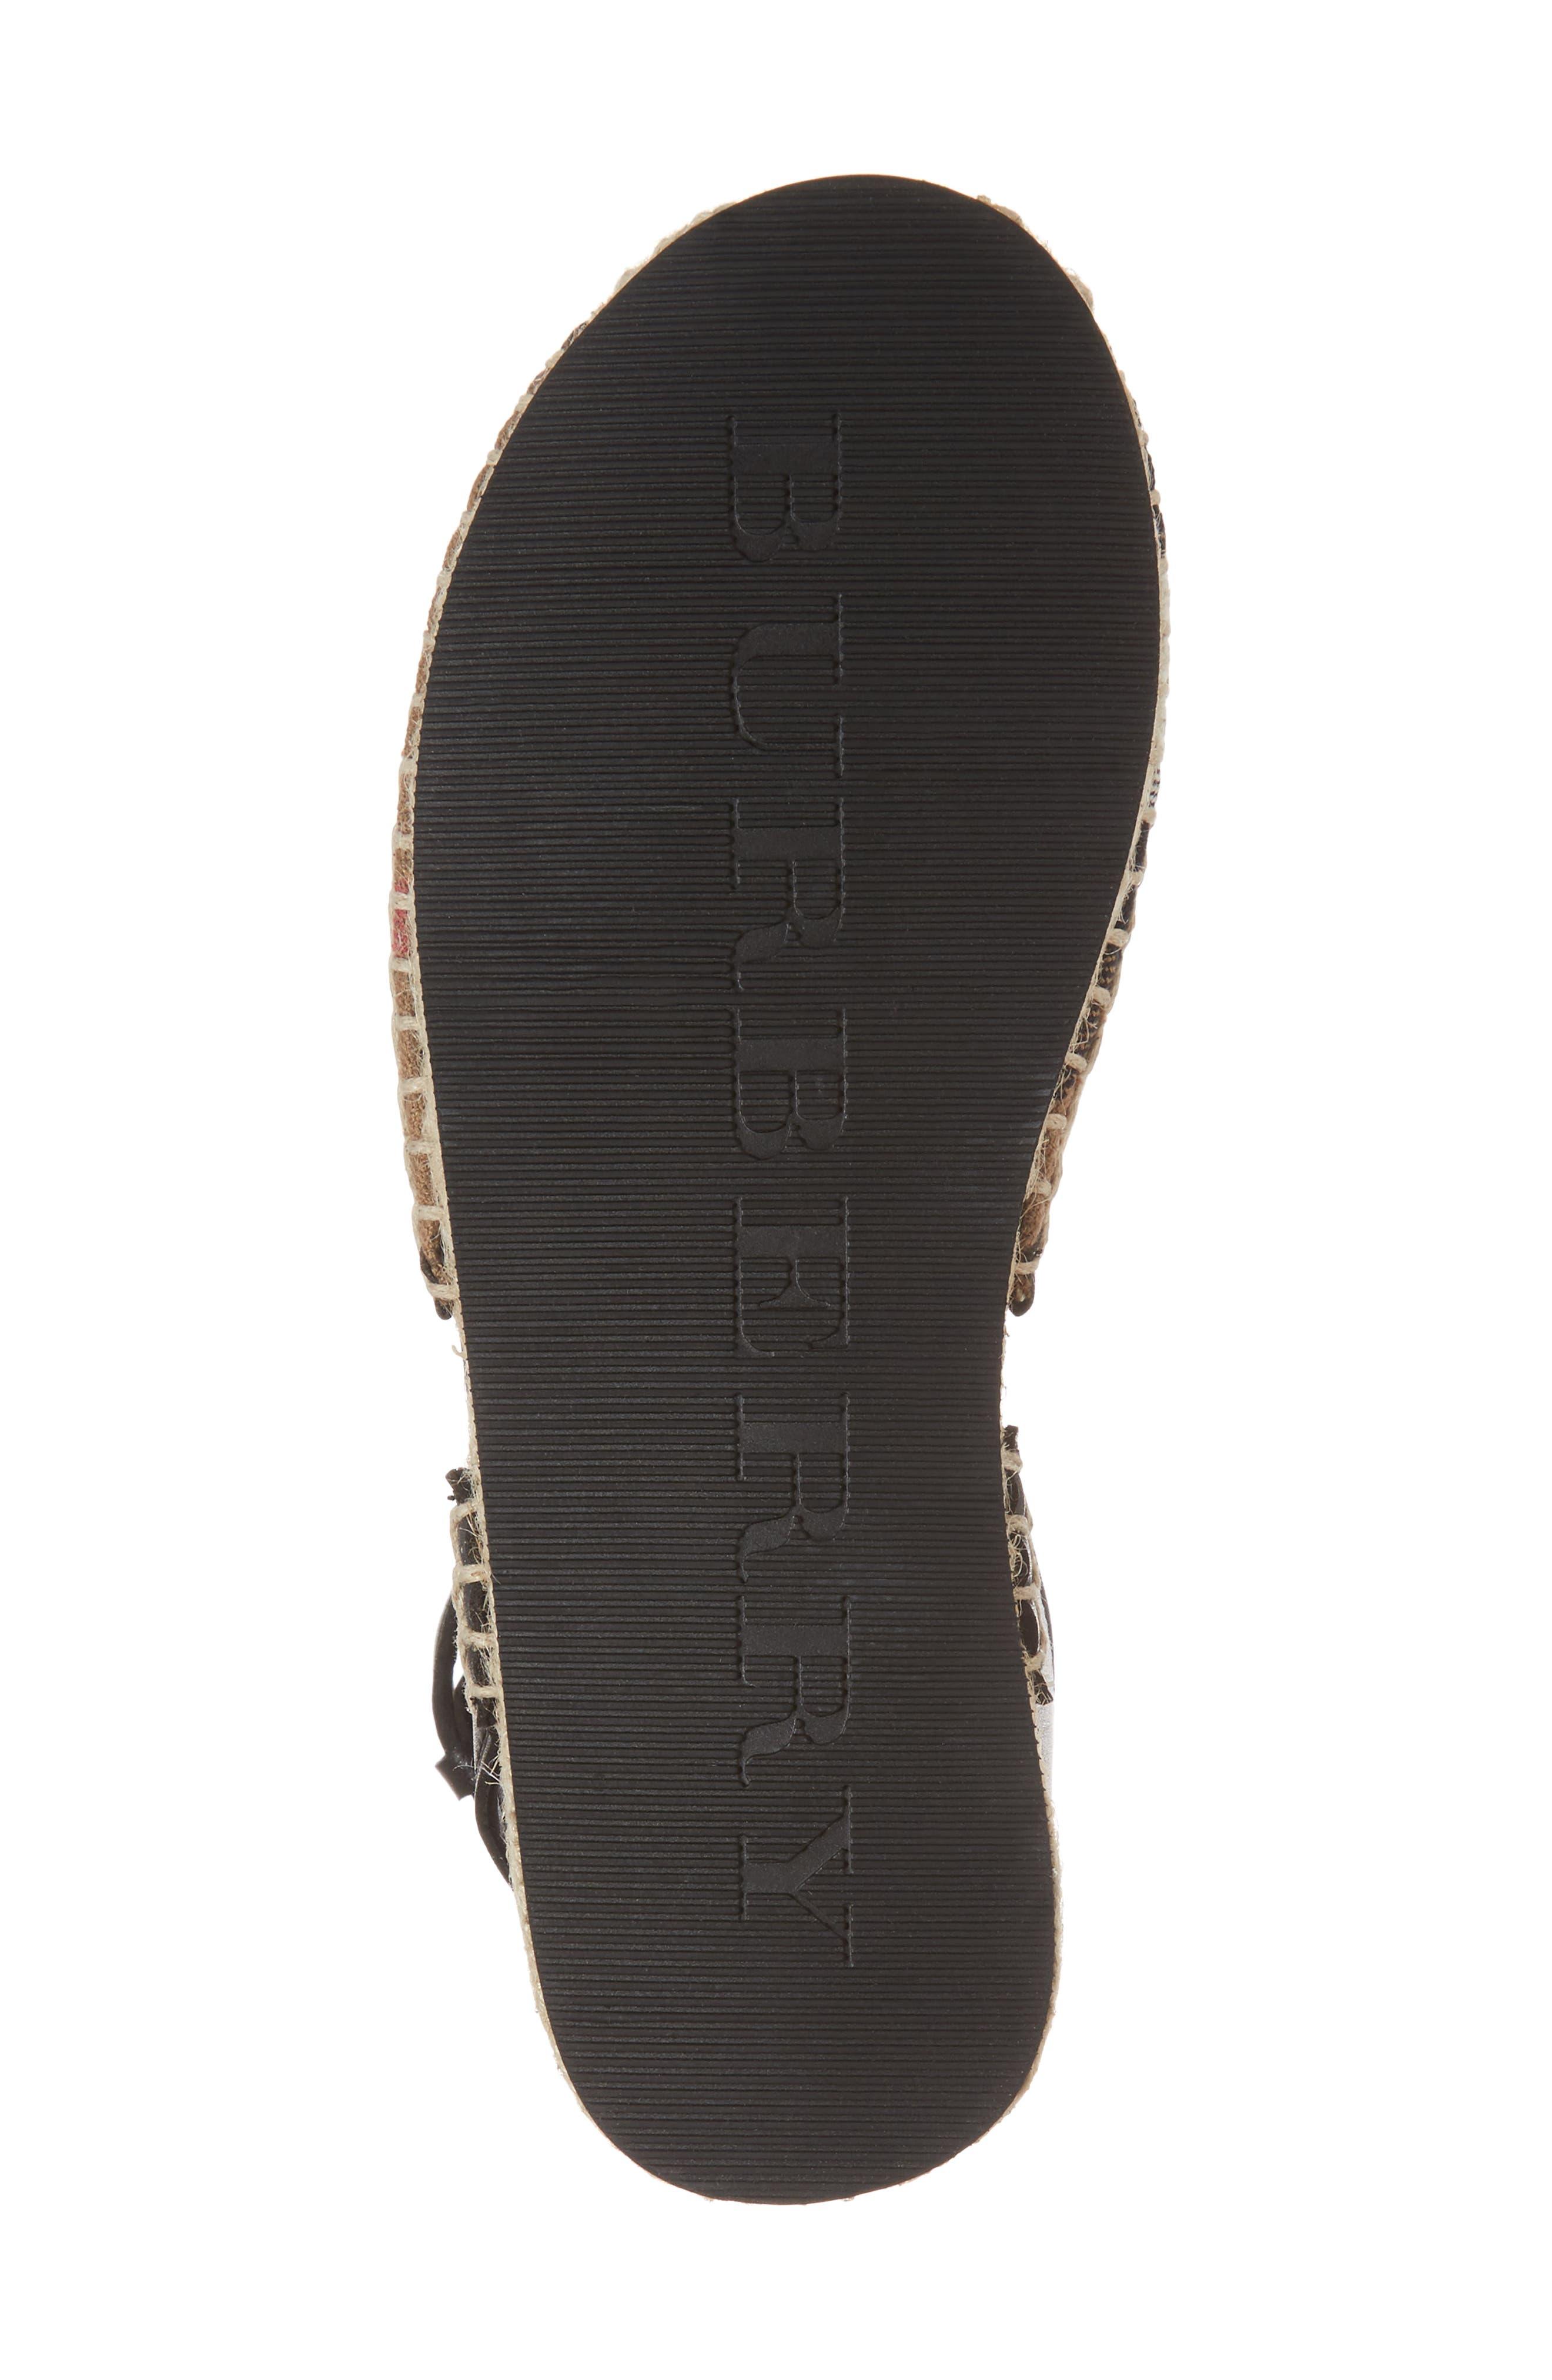 Perth Ankle Strap Sandal,                             Alternate thumbnail 6, color,                             BLACK